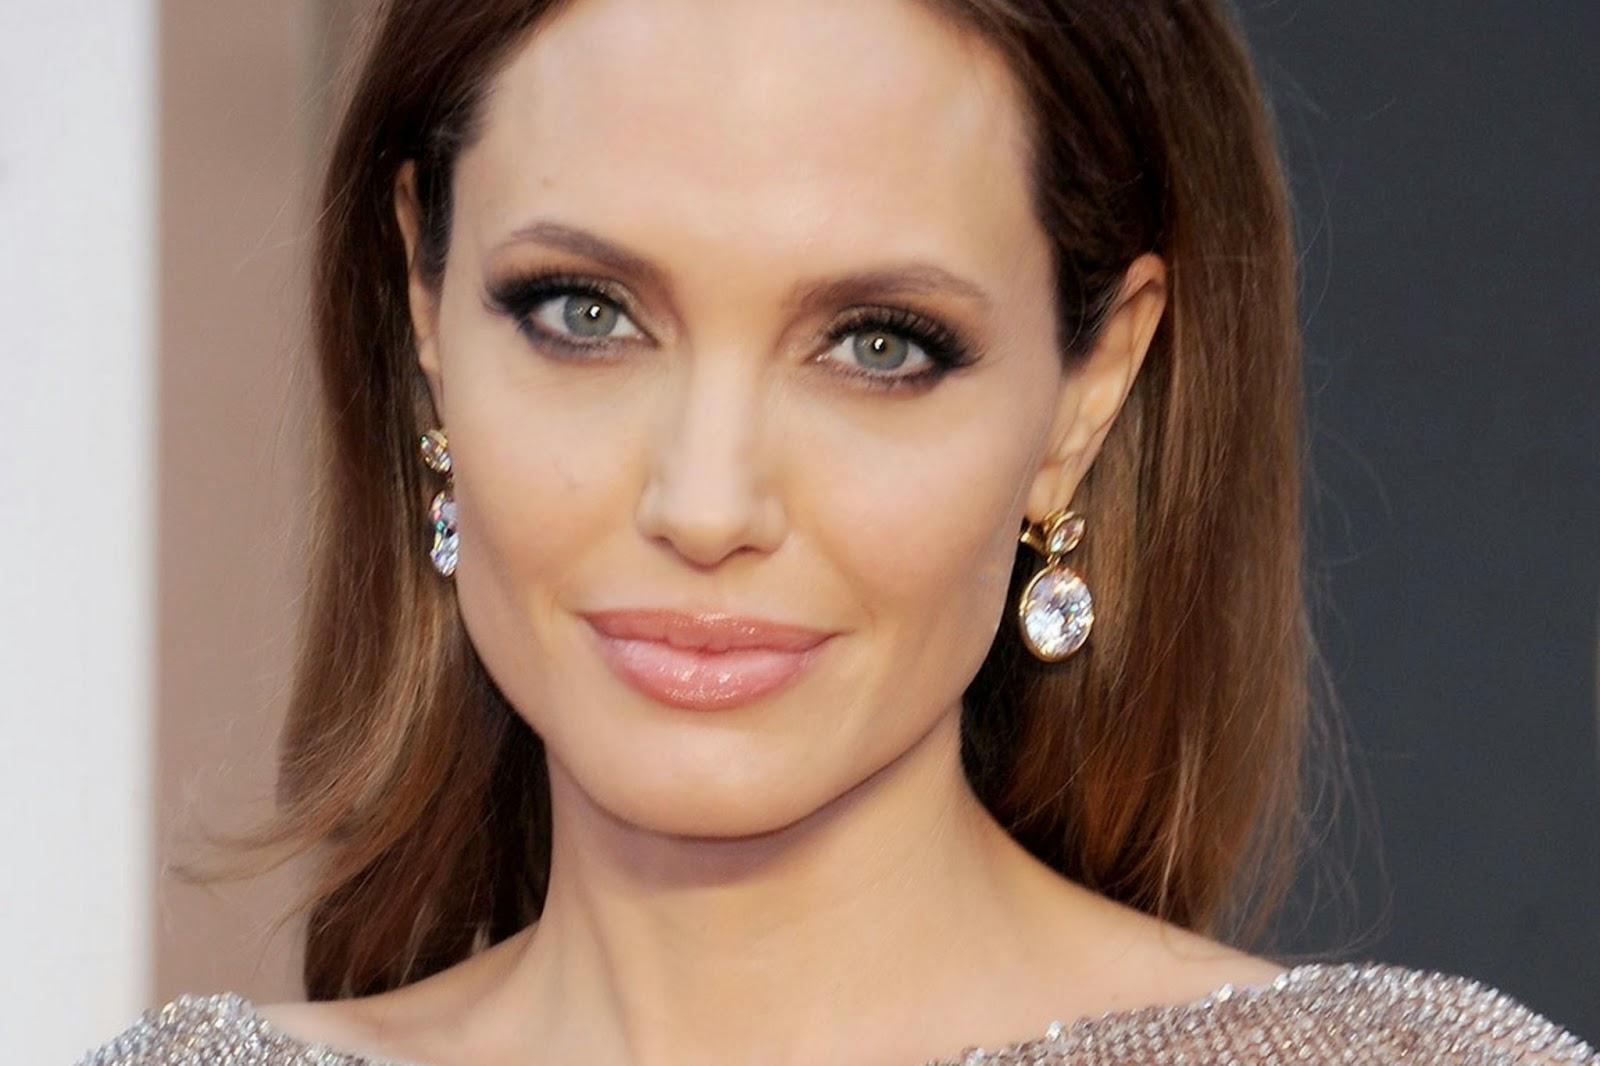 "<img src=""http://1.bp.blogspot.com/-b-eNXQKXzQs/VDBH2Xc5ePI/AAAAAAAAA6Y/I9tA5N3p44w/s1600/angelina.jpeg"" alt=""Top 5 Most Beautiful Womens in the World 2014 to 2015"" />"